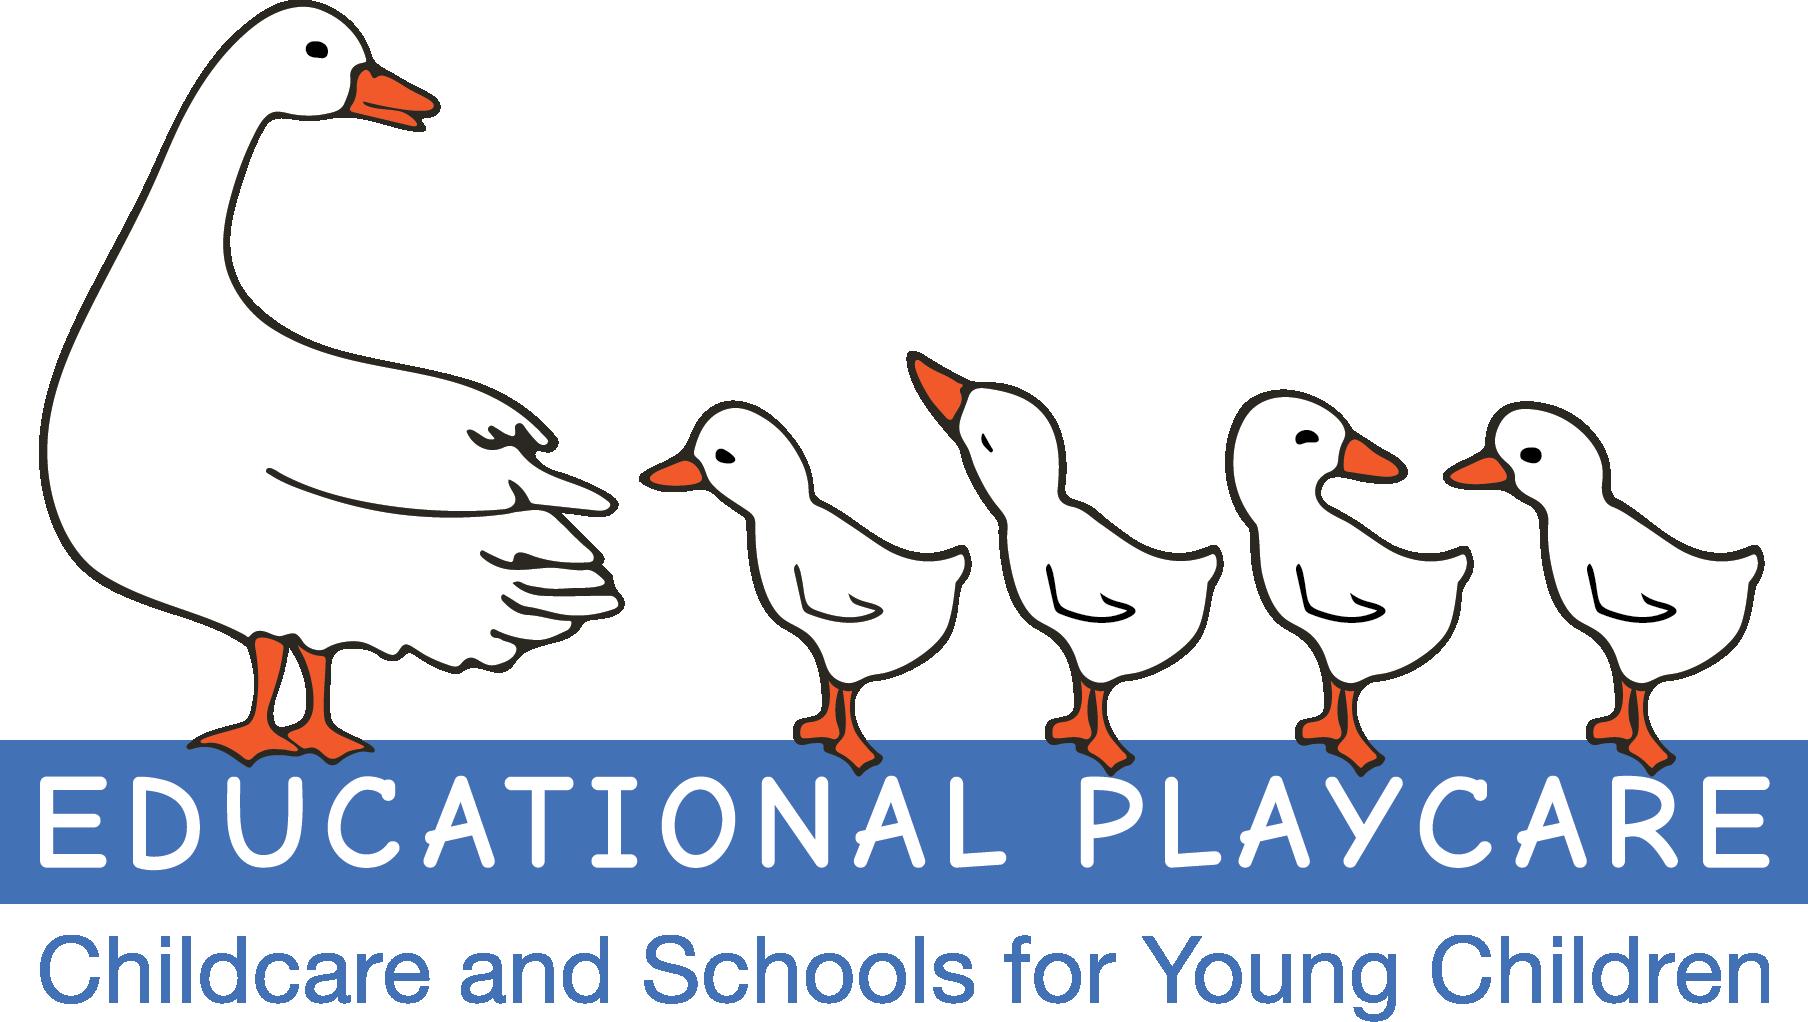 Educational Playcare logo